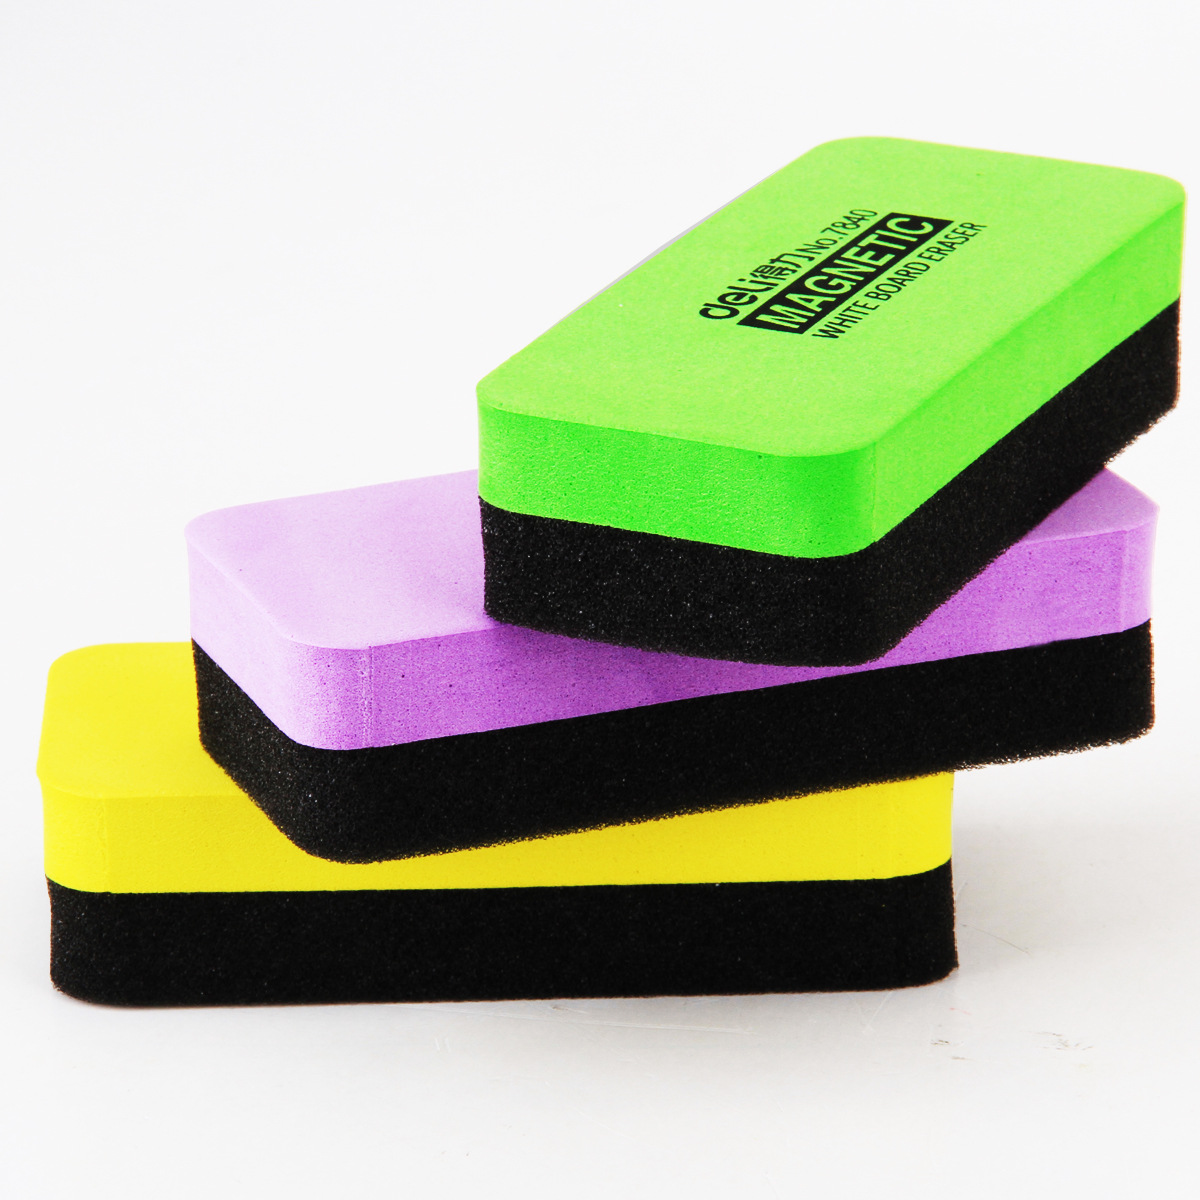 1 Pcs 110mm X 50mm X 30mm 고품질 마그네틱 화이트 보드 지우개 Drywipe 마커 클리너 학교 사무실 화이트 보드 용품